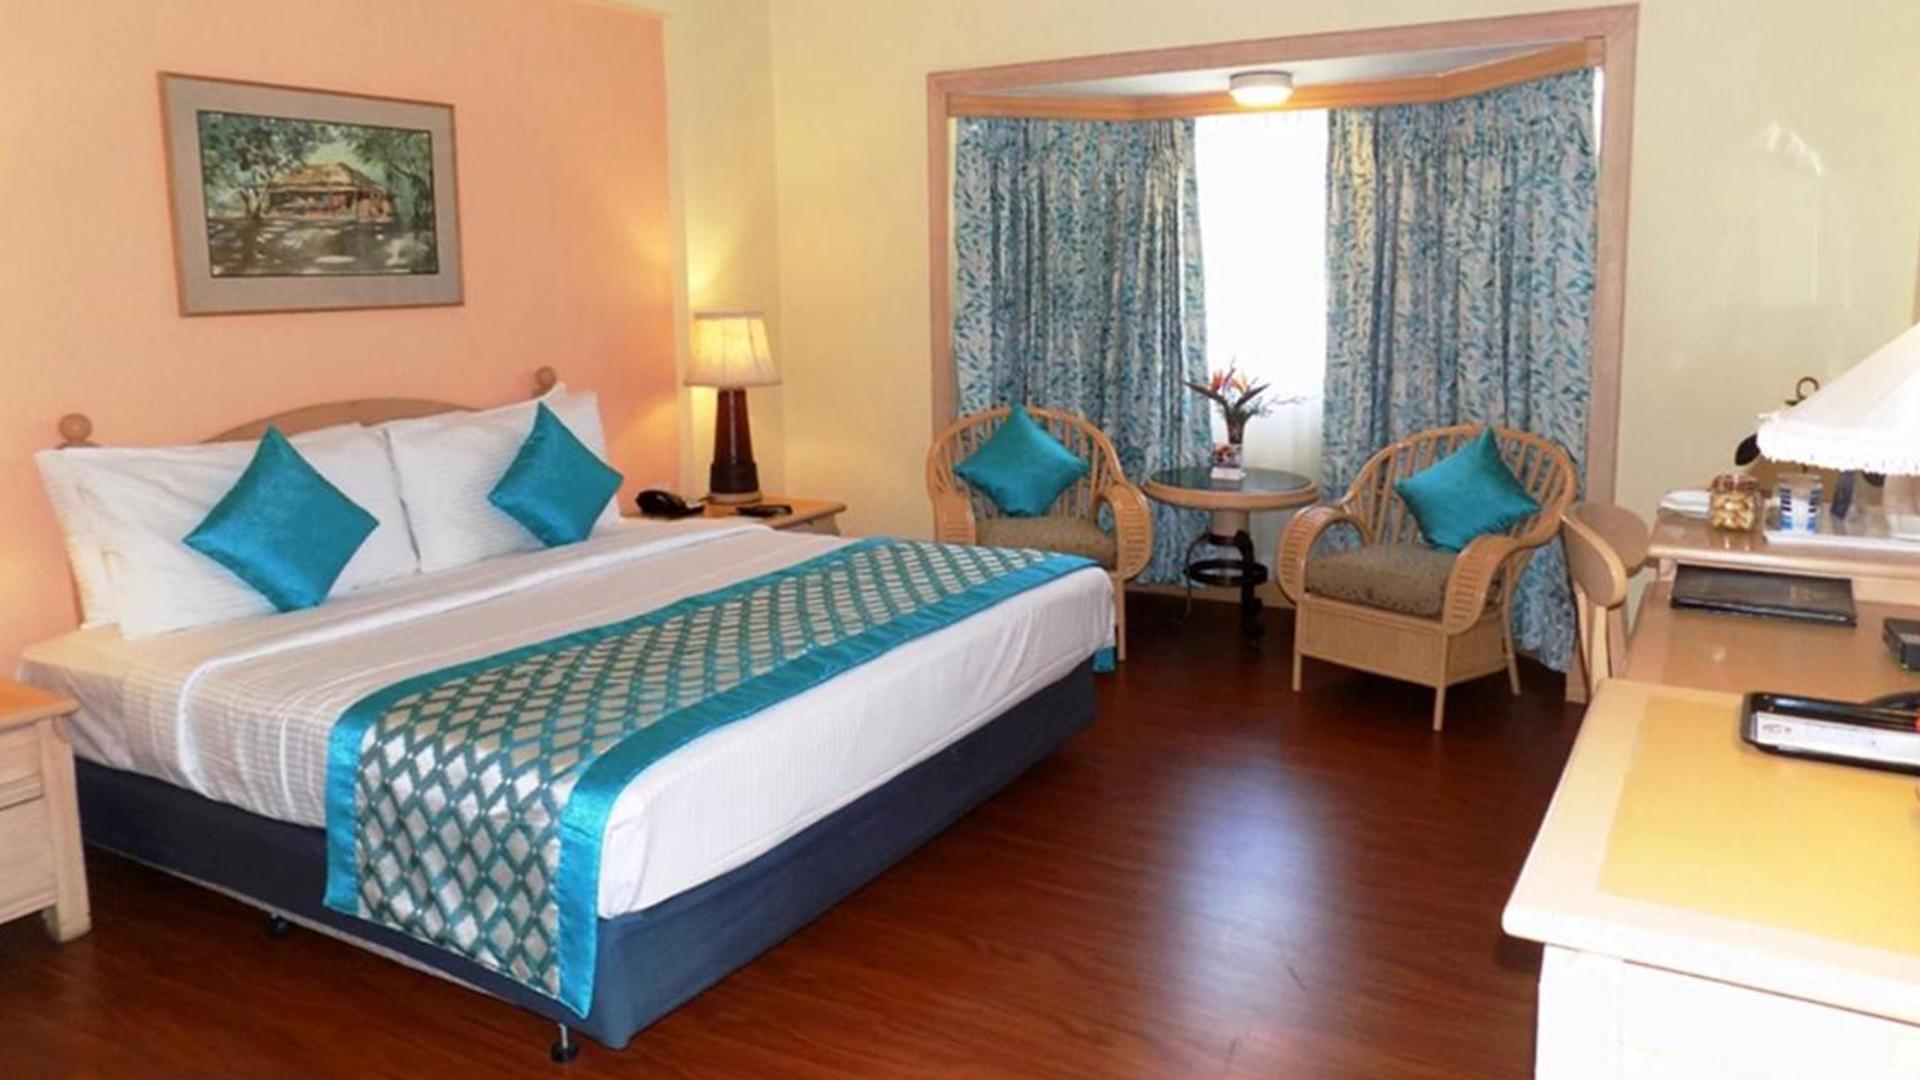 Standard Room image 1 at Fortune Resort Sullivan Court, Ooty by Nilgiris, Tamil Nadu, India